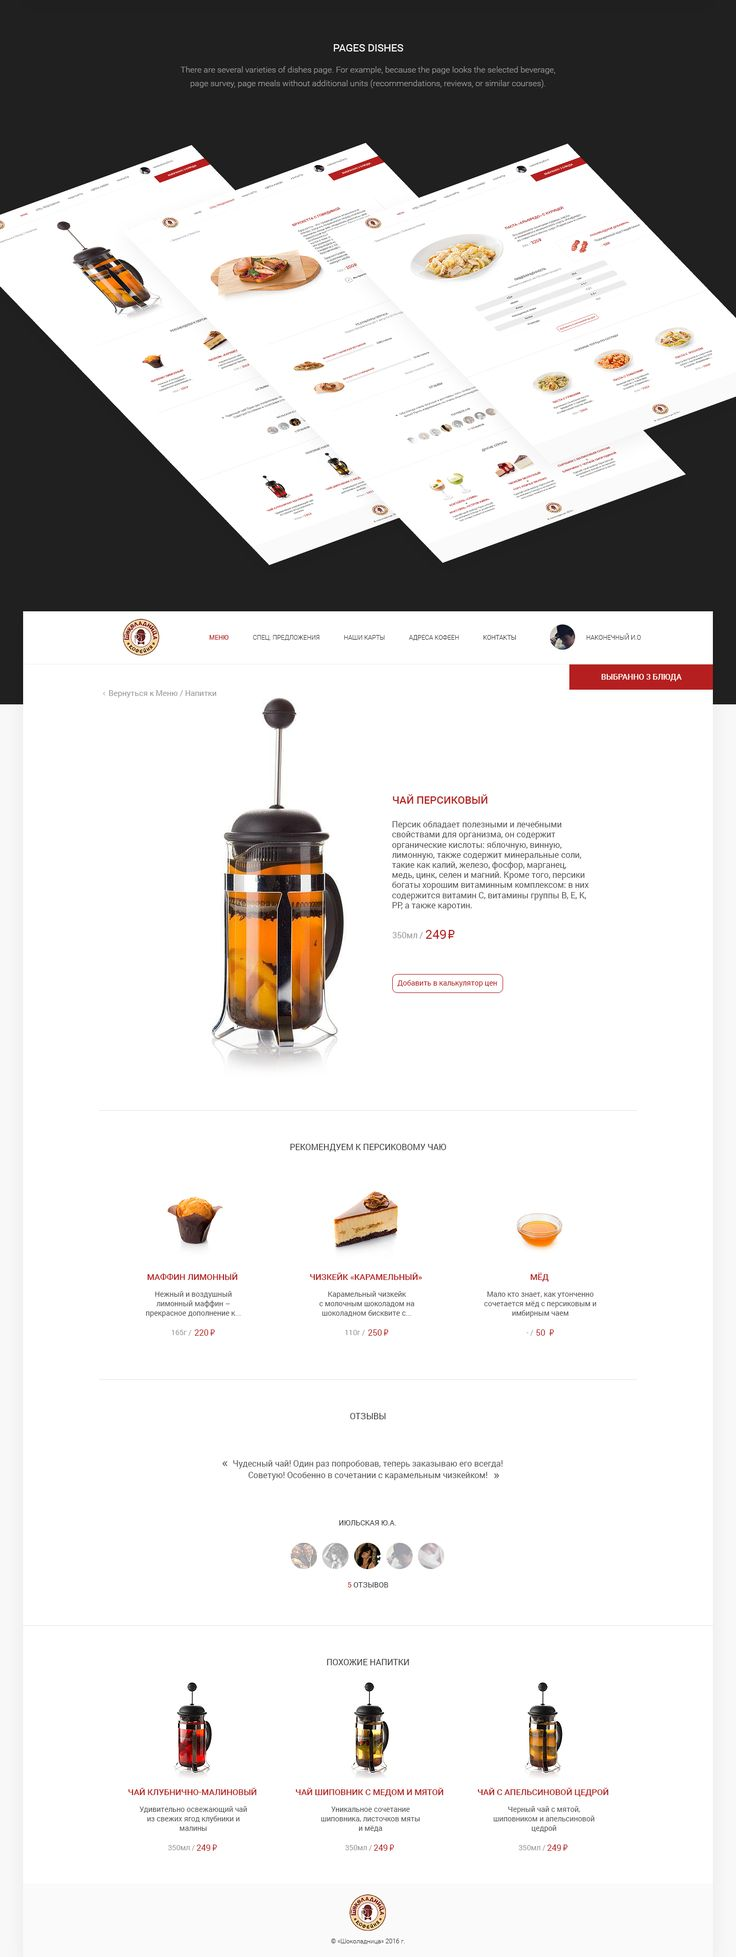 Redesign Shoko.ru #Be #behance #web #website #design #UI #UX #site #webdesign #website #shoko #redesign